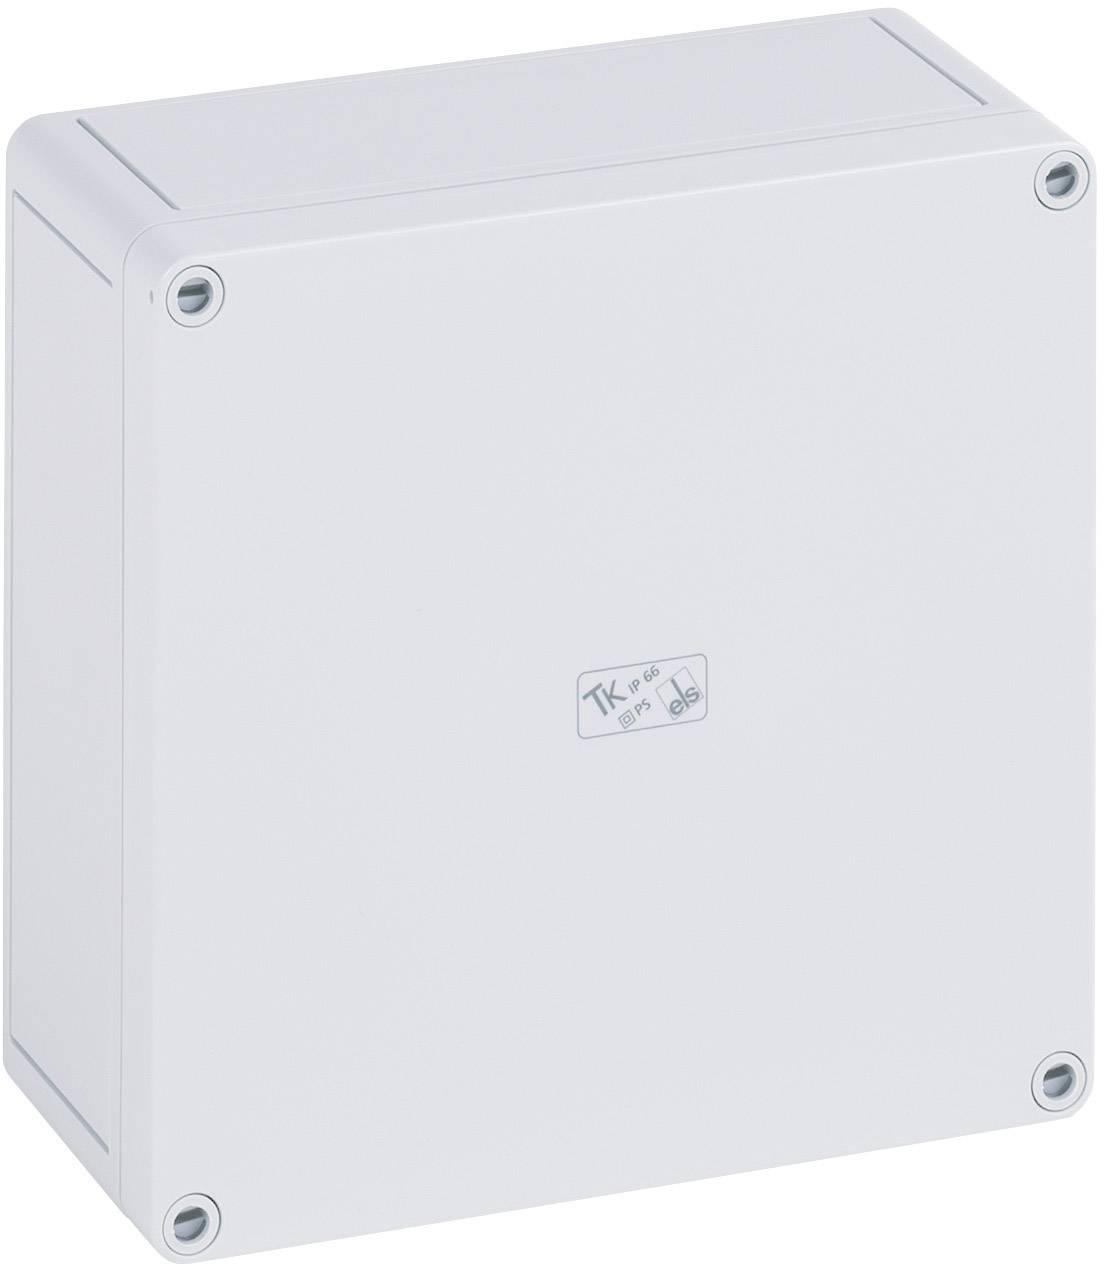 Inštalačná krabička Spelsberg TK PS 1809-8 11091001, (d x š x v) 180 x 94 x 81 mm, polystyrén, svetlo sivá (RAL 7035), 1 ks